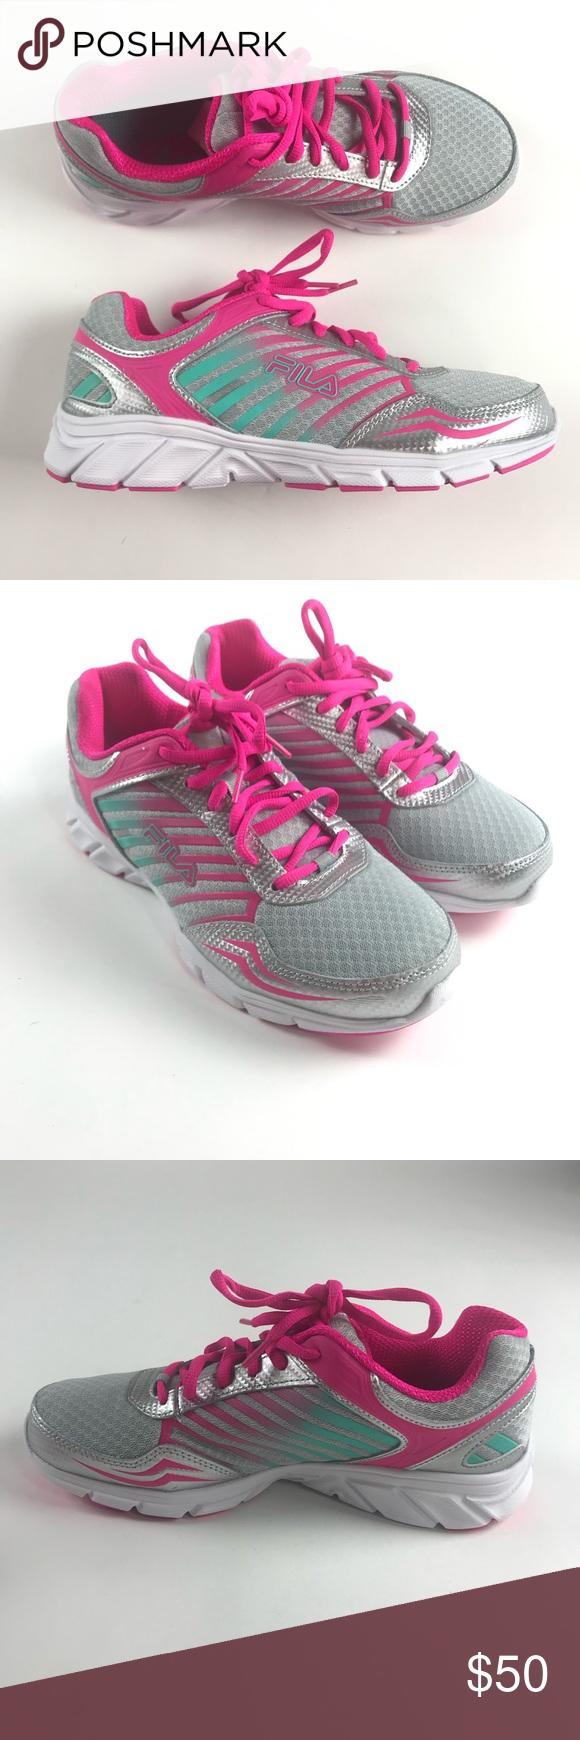 692b38f855cf Fila Gamble Running Shoes 8.5 Fila Gamble women s running shoes - brand new  without original box. Never been worn. Style   5SR20964-250.